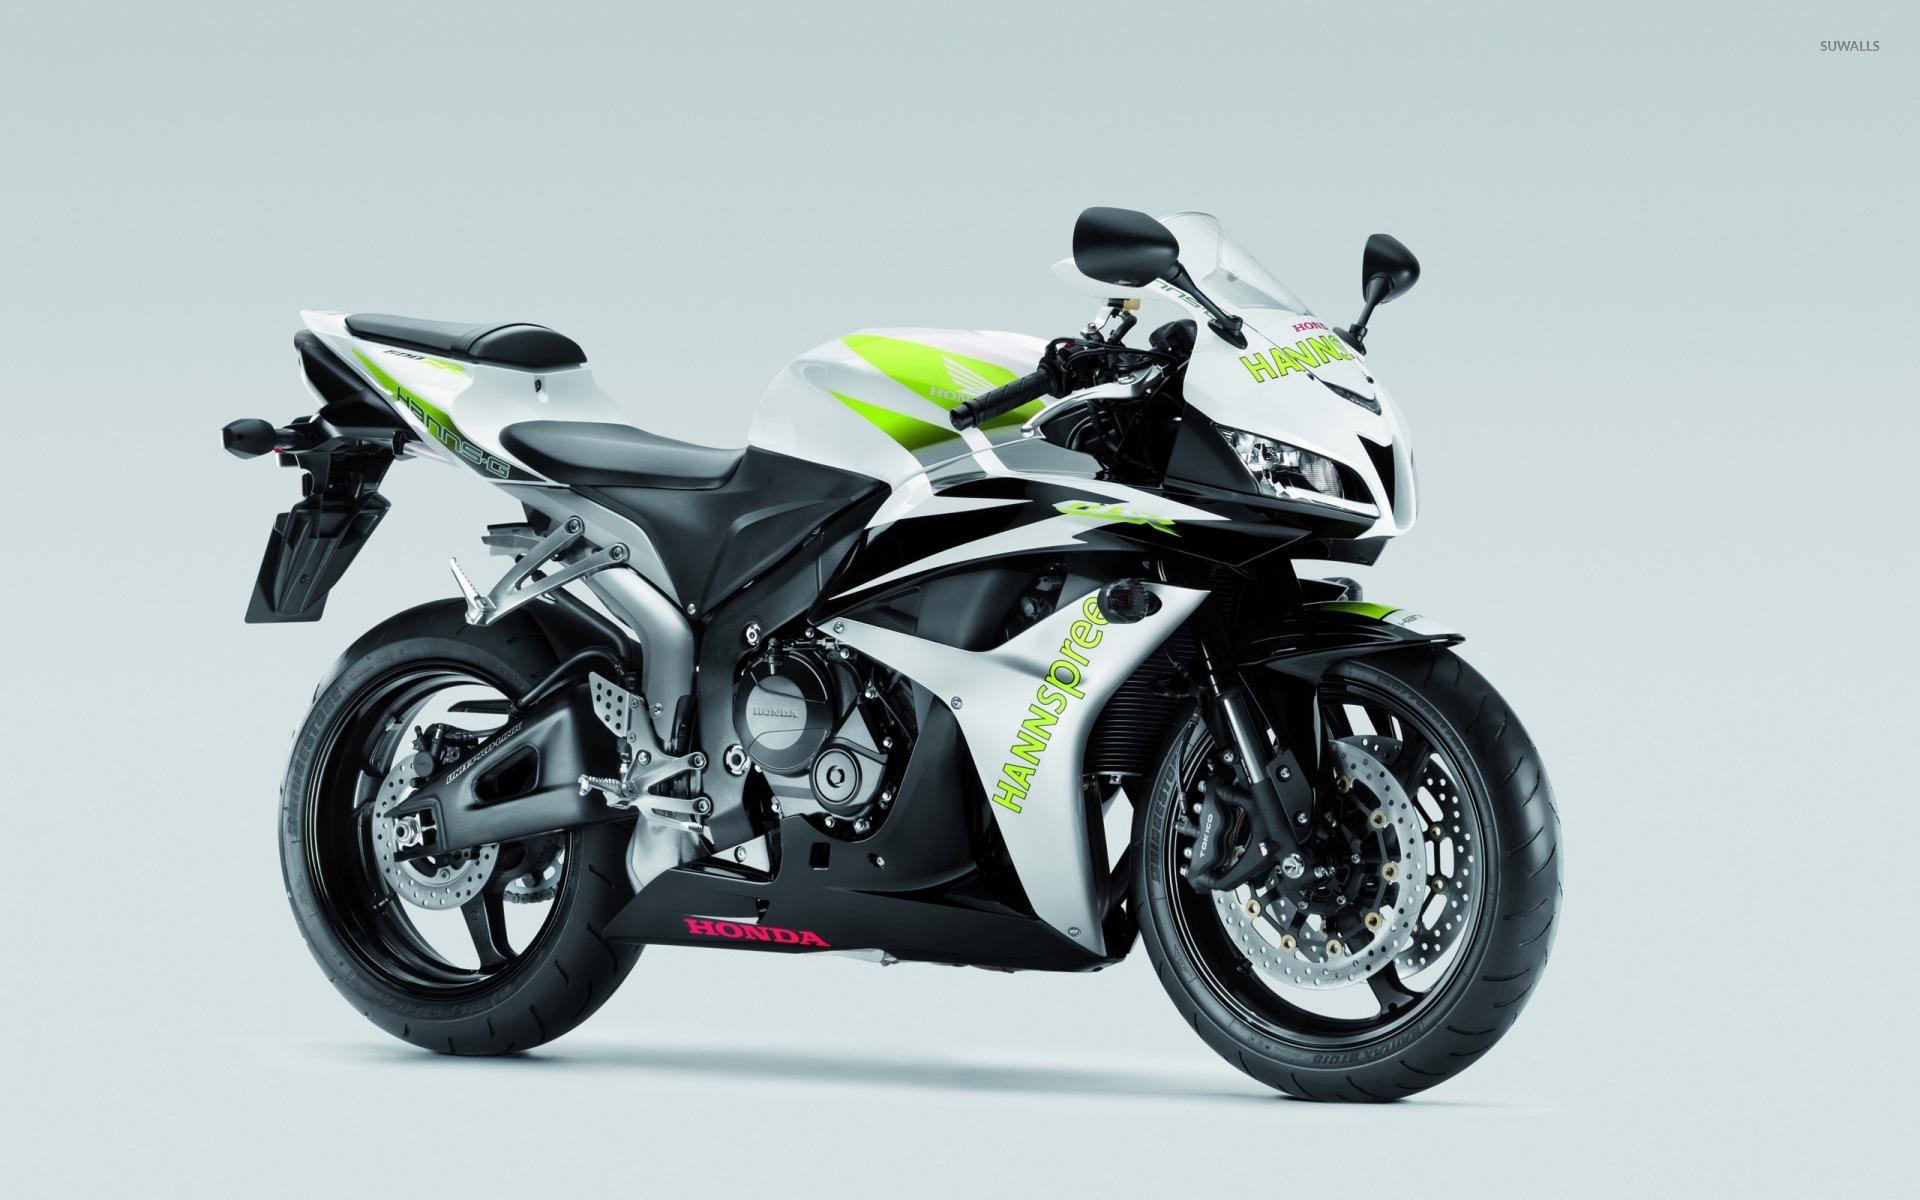 Honda CBR 600RR wallpaper   Motorcycle wallpapers   2621 1920x1200